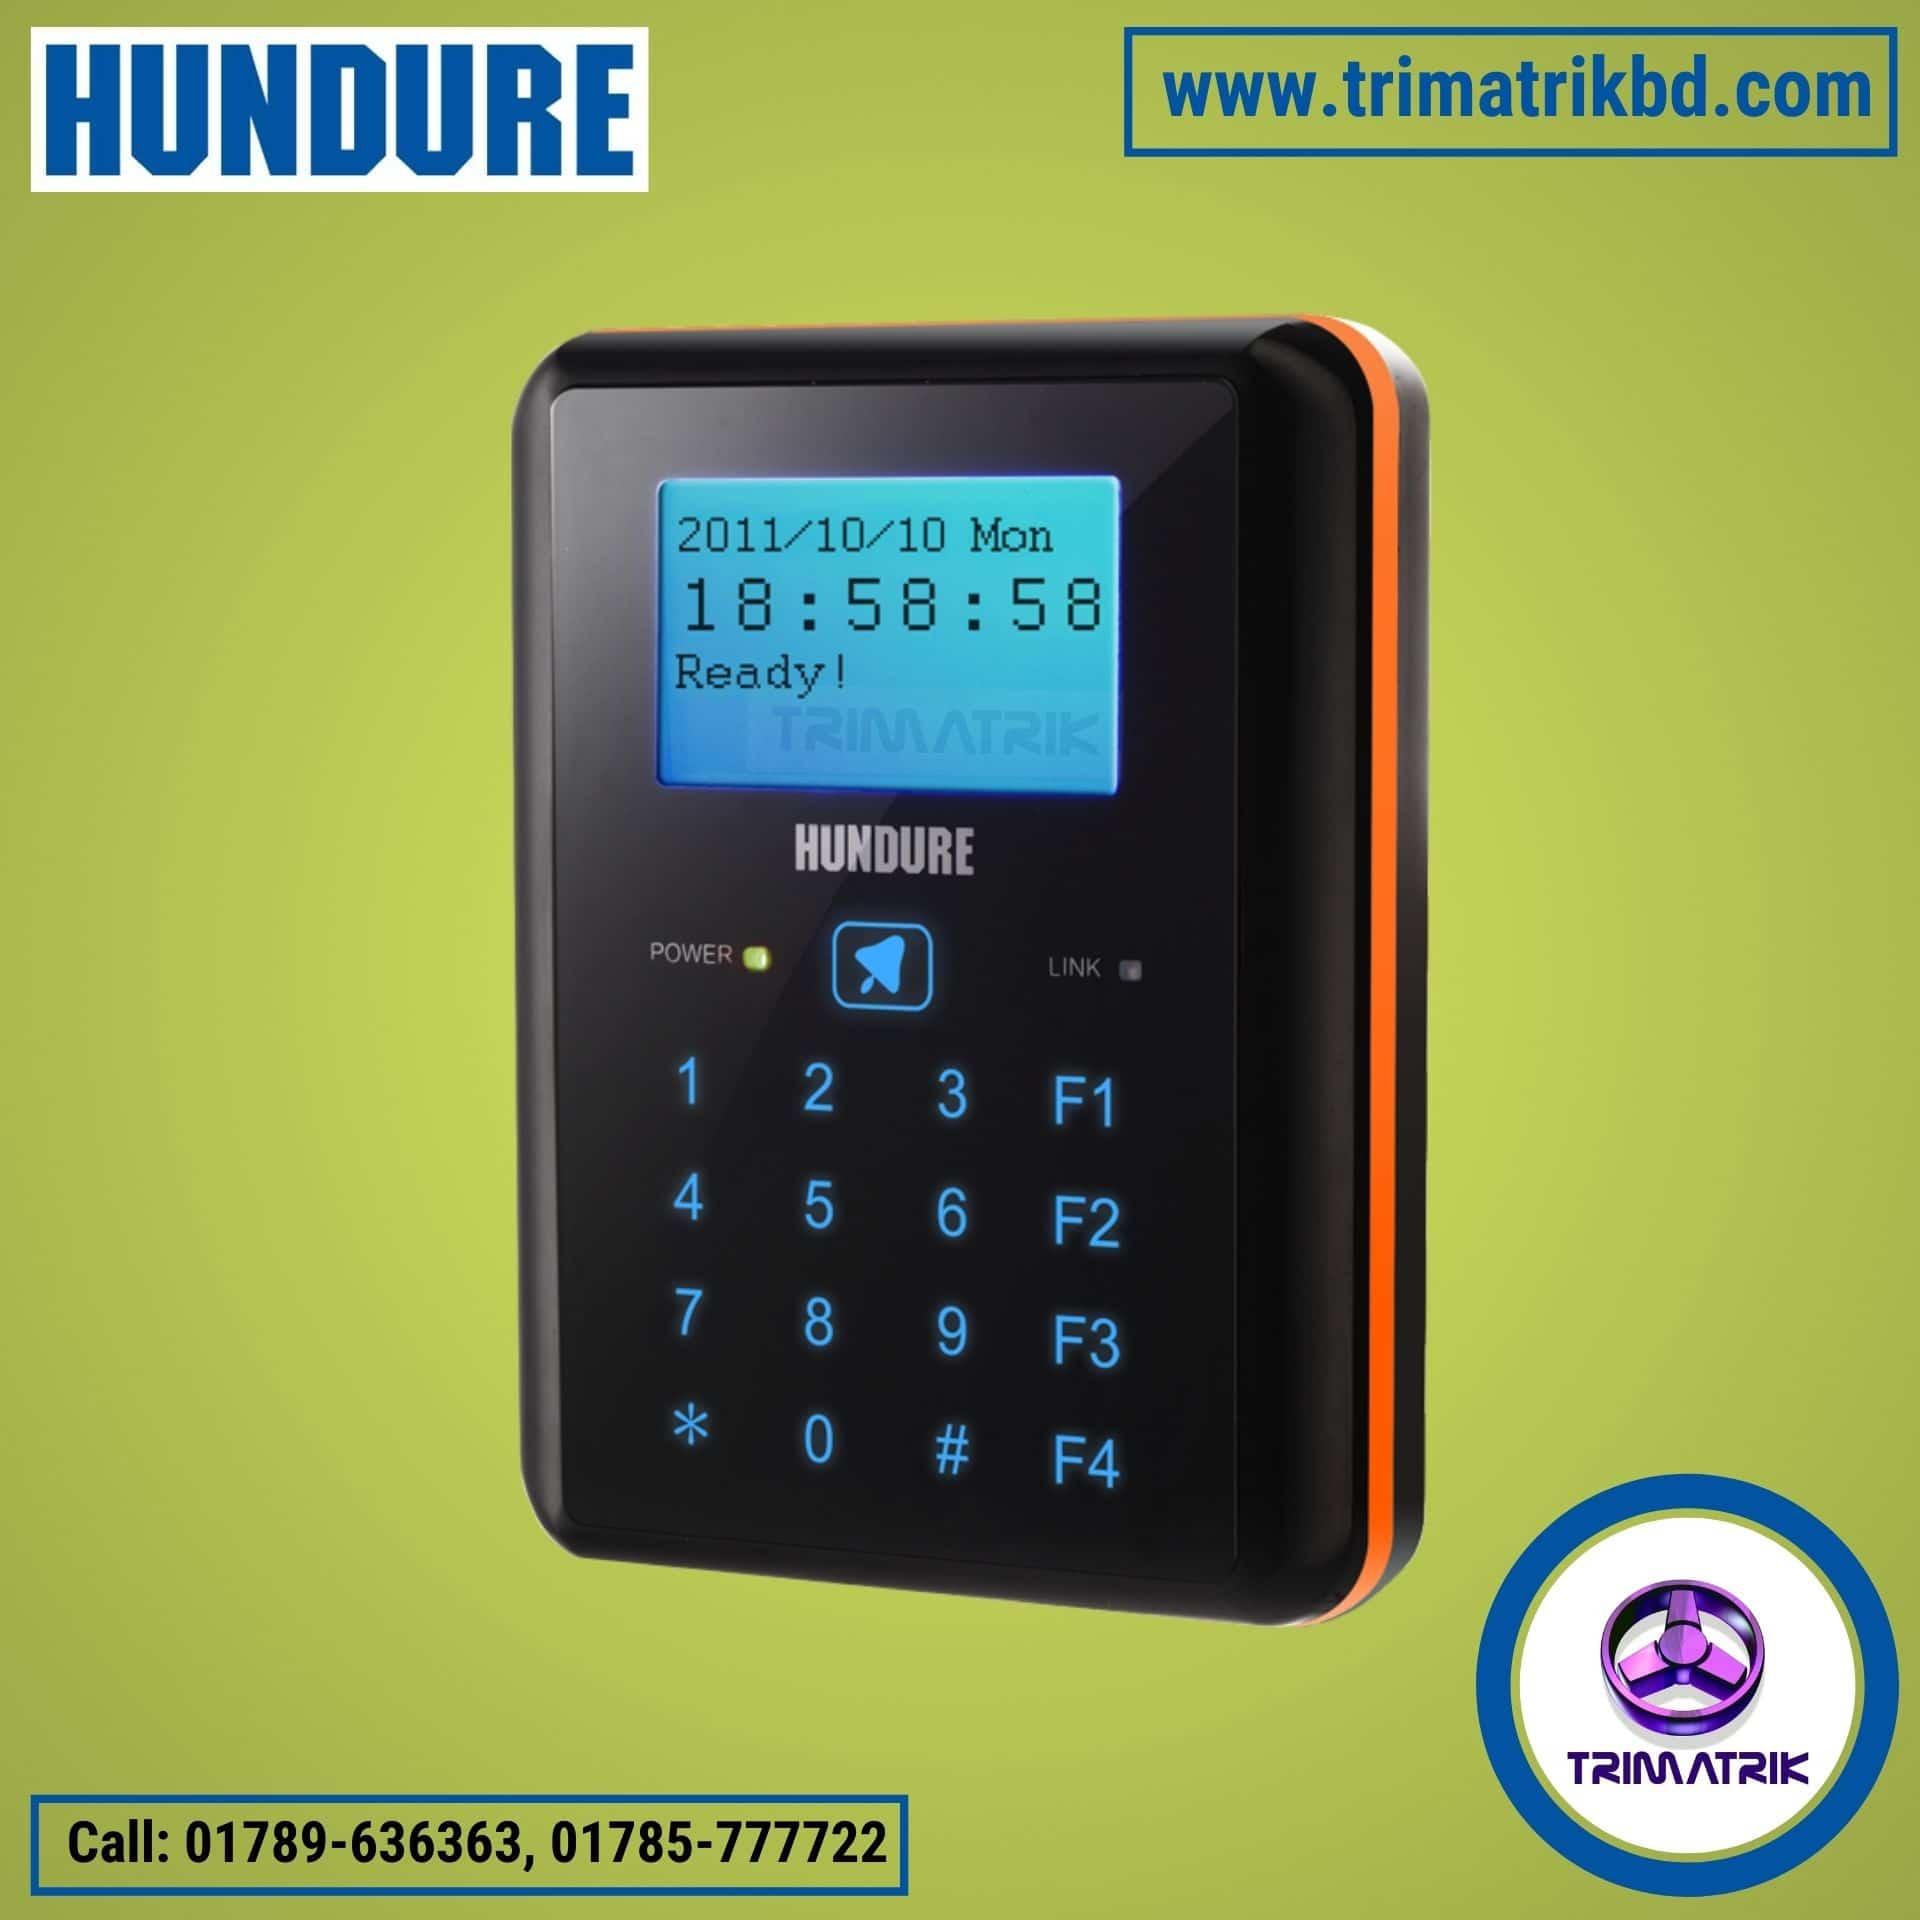 Hundure RAC-960PE Bangladesh